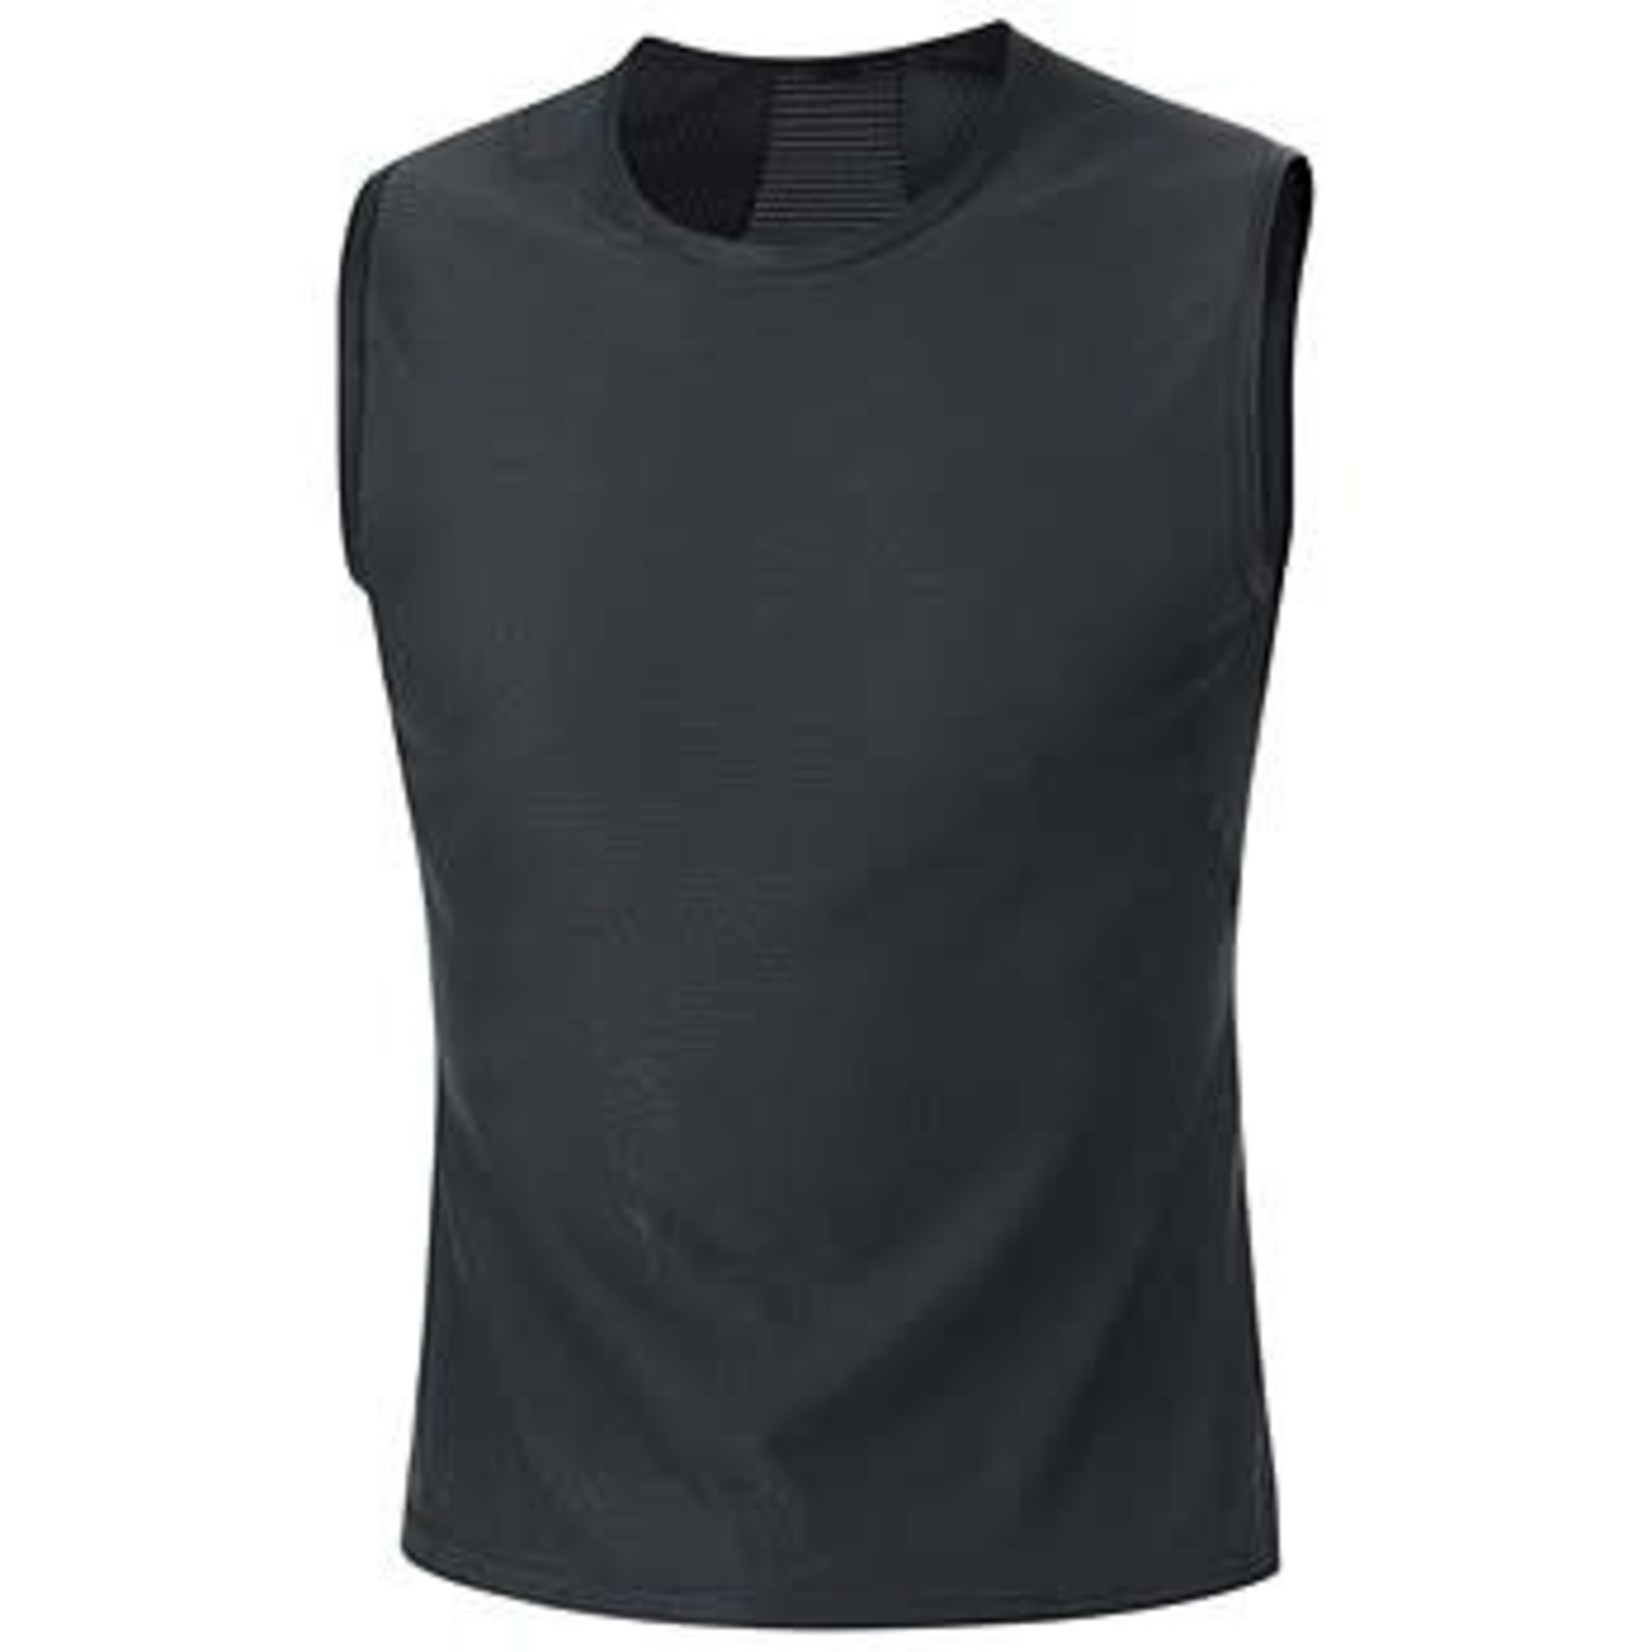 GORE Wear GORE M GWS BL Sleeveless Shirt black L